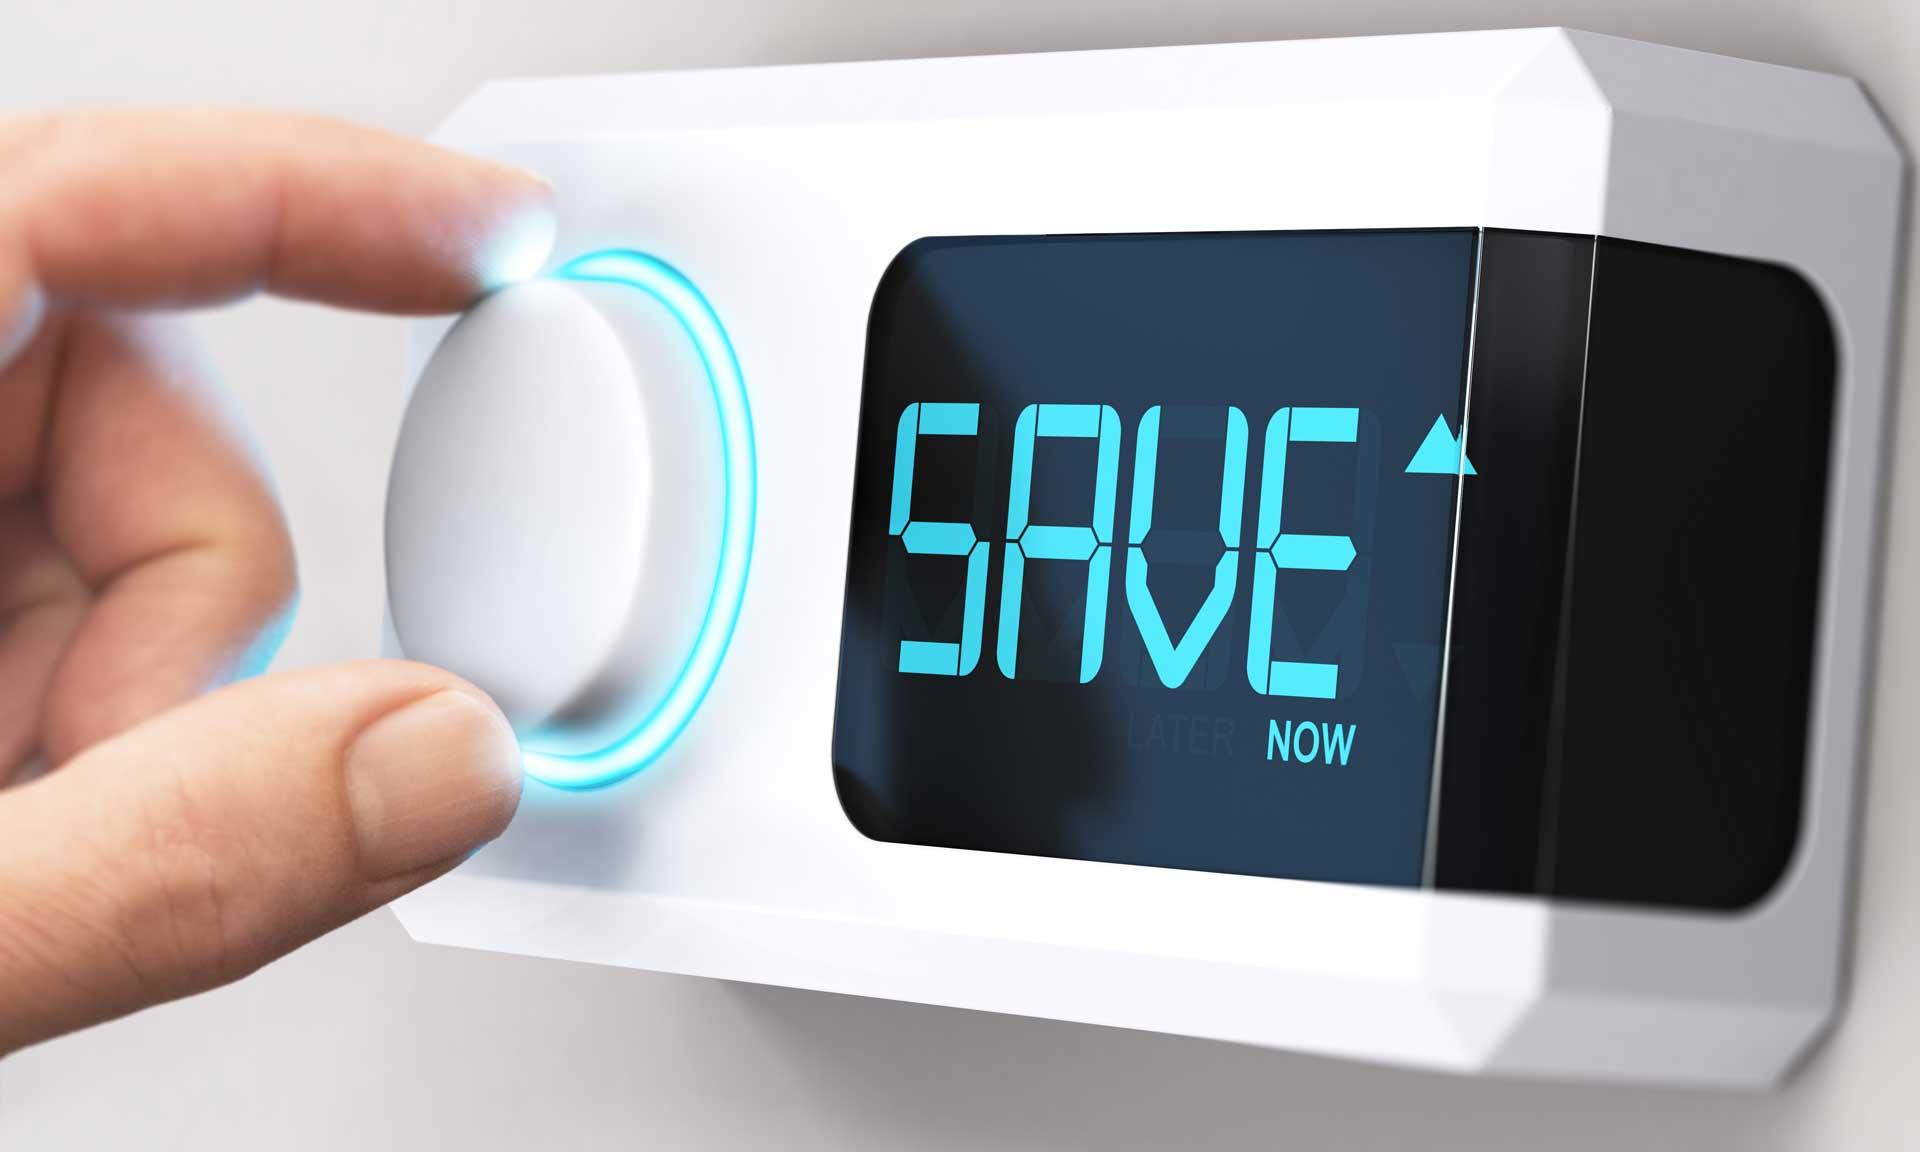 Landlord Energy Saving Tips for Tenants